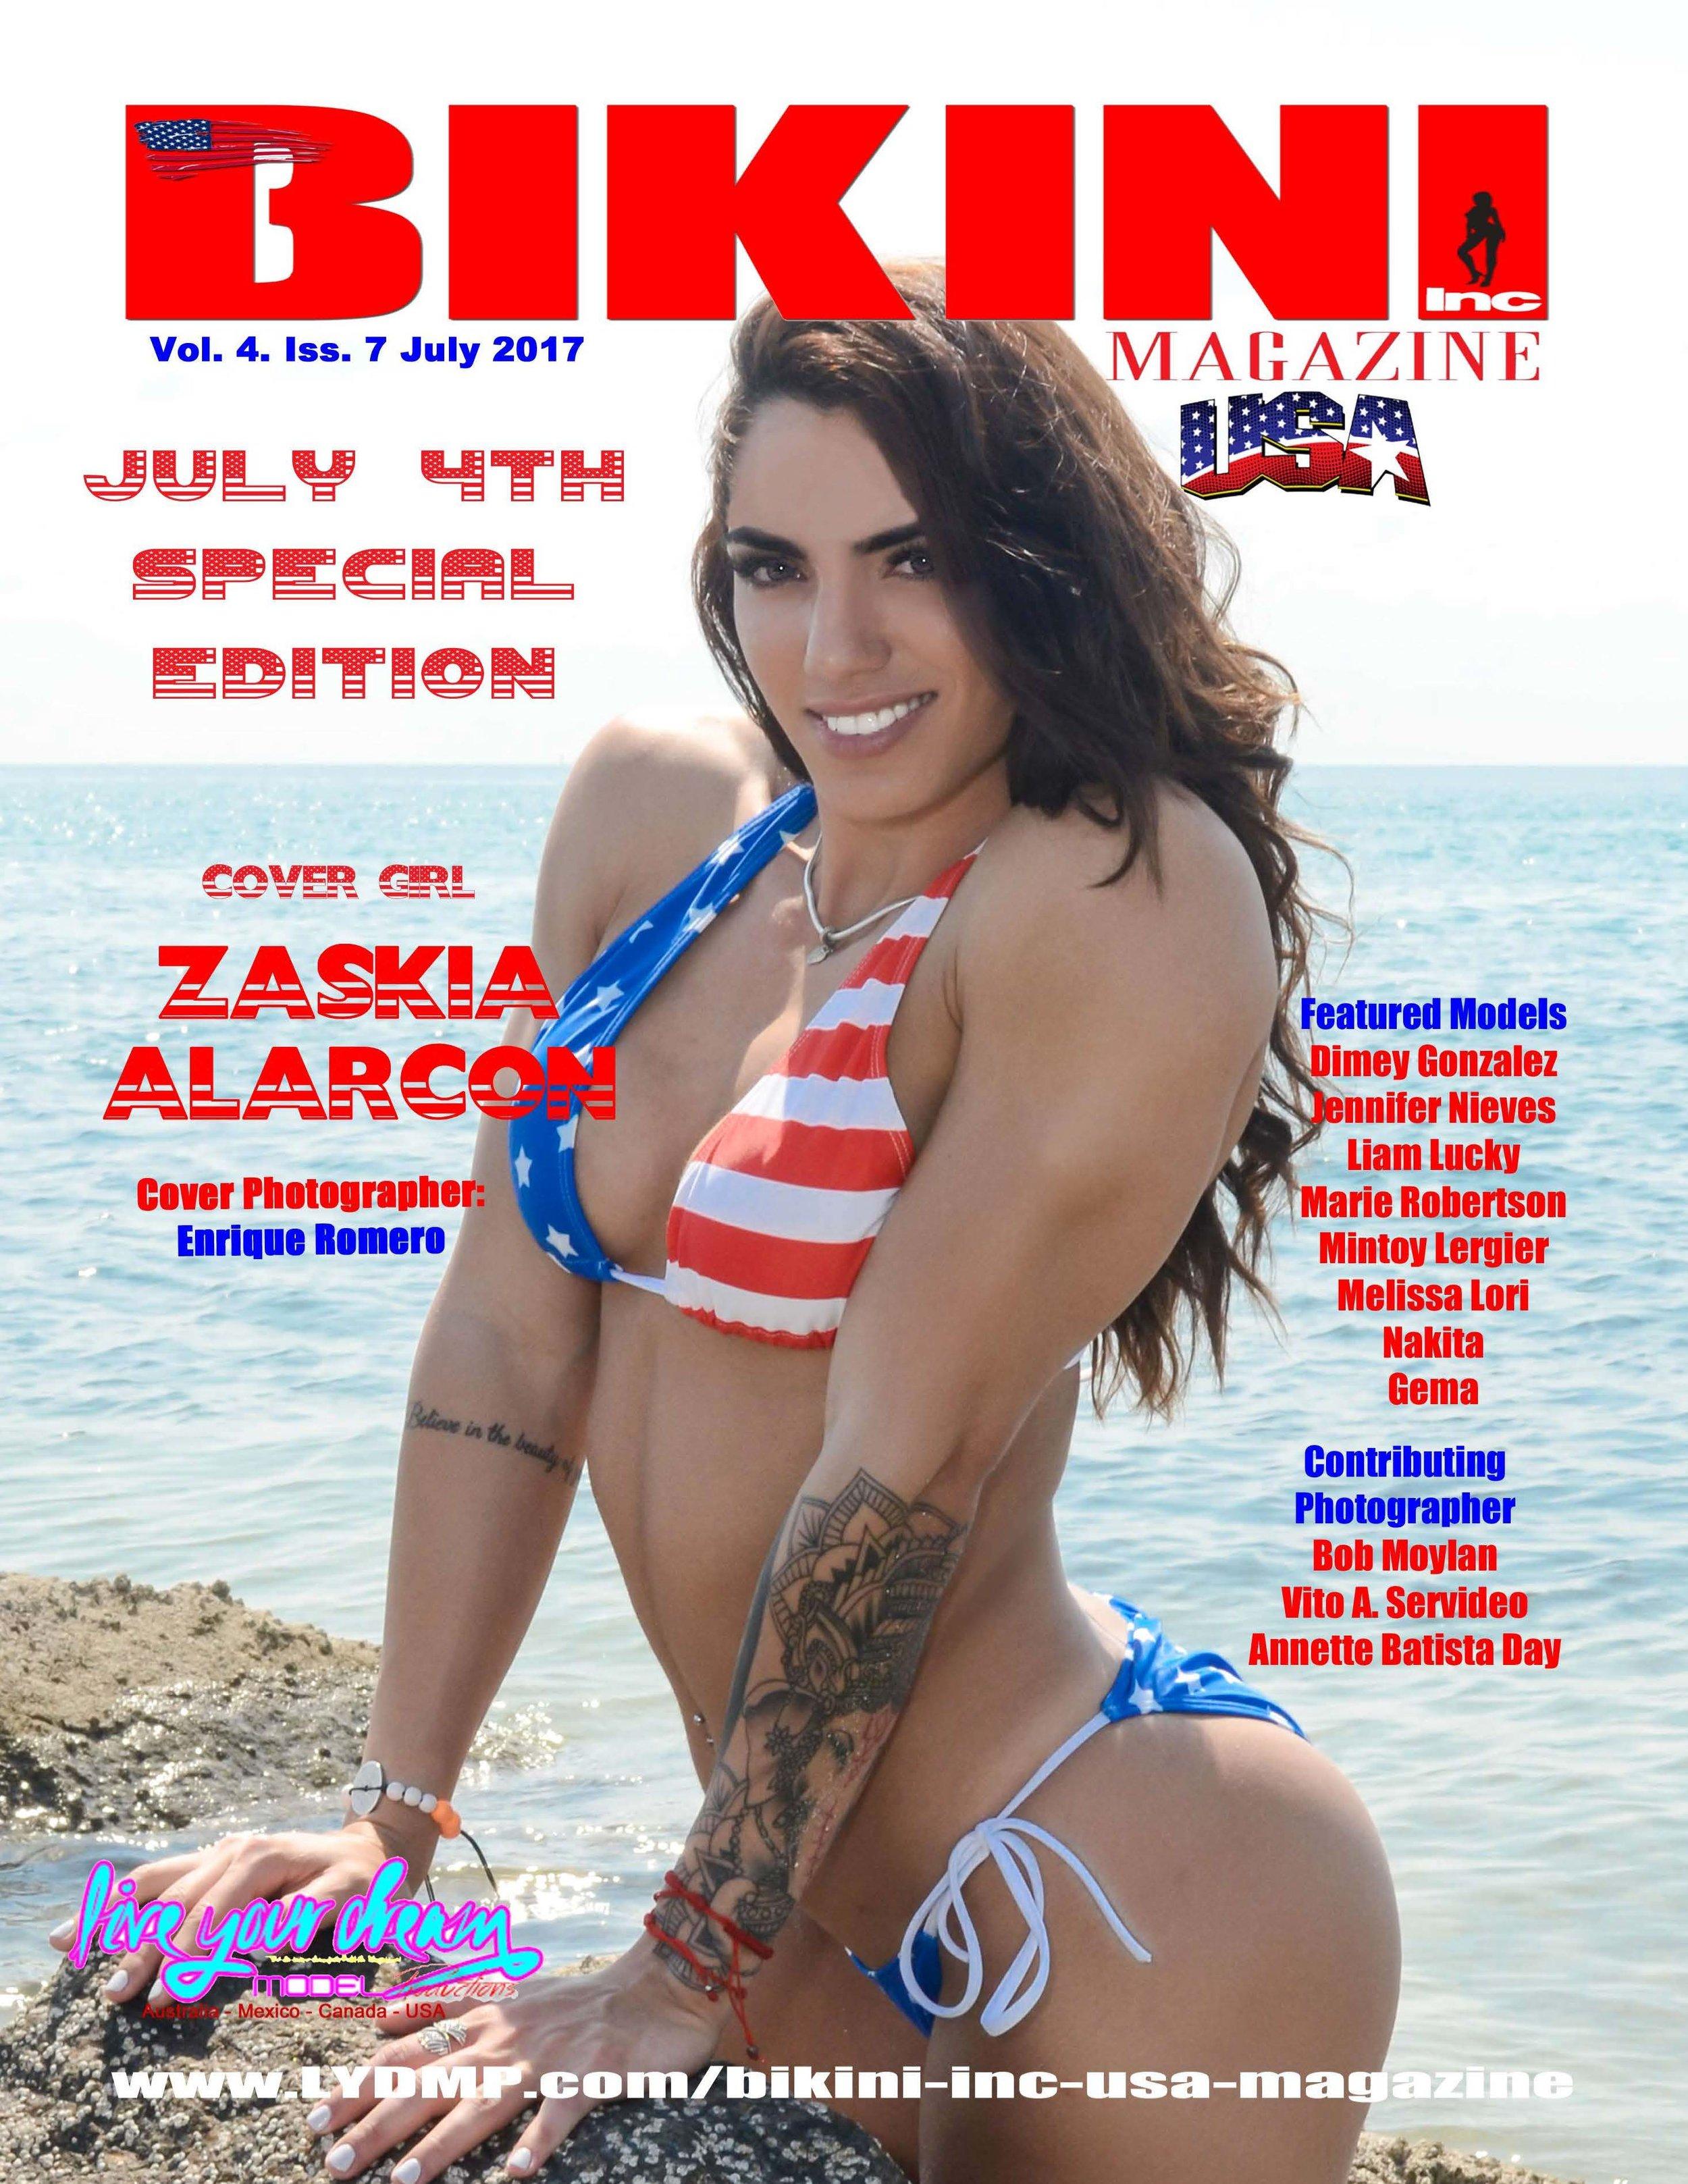 01-Bikini Inc USA Magazine - July 2017-ZA.jpg